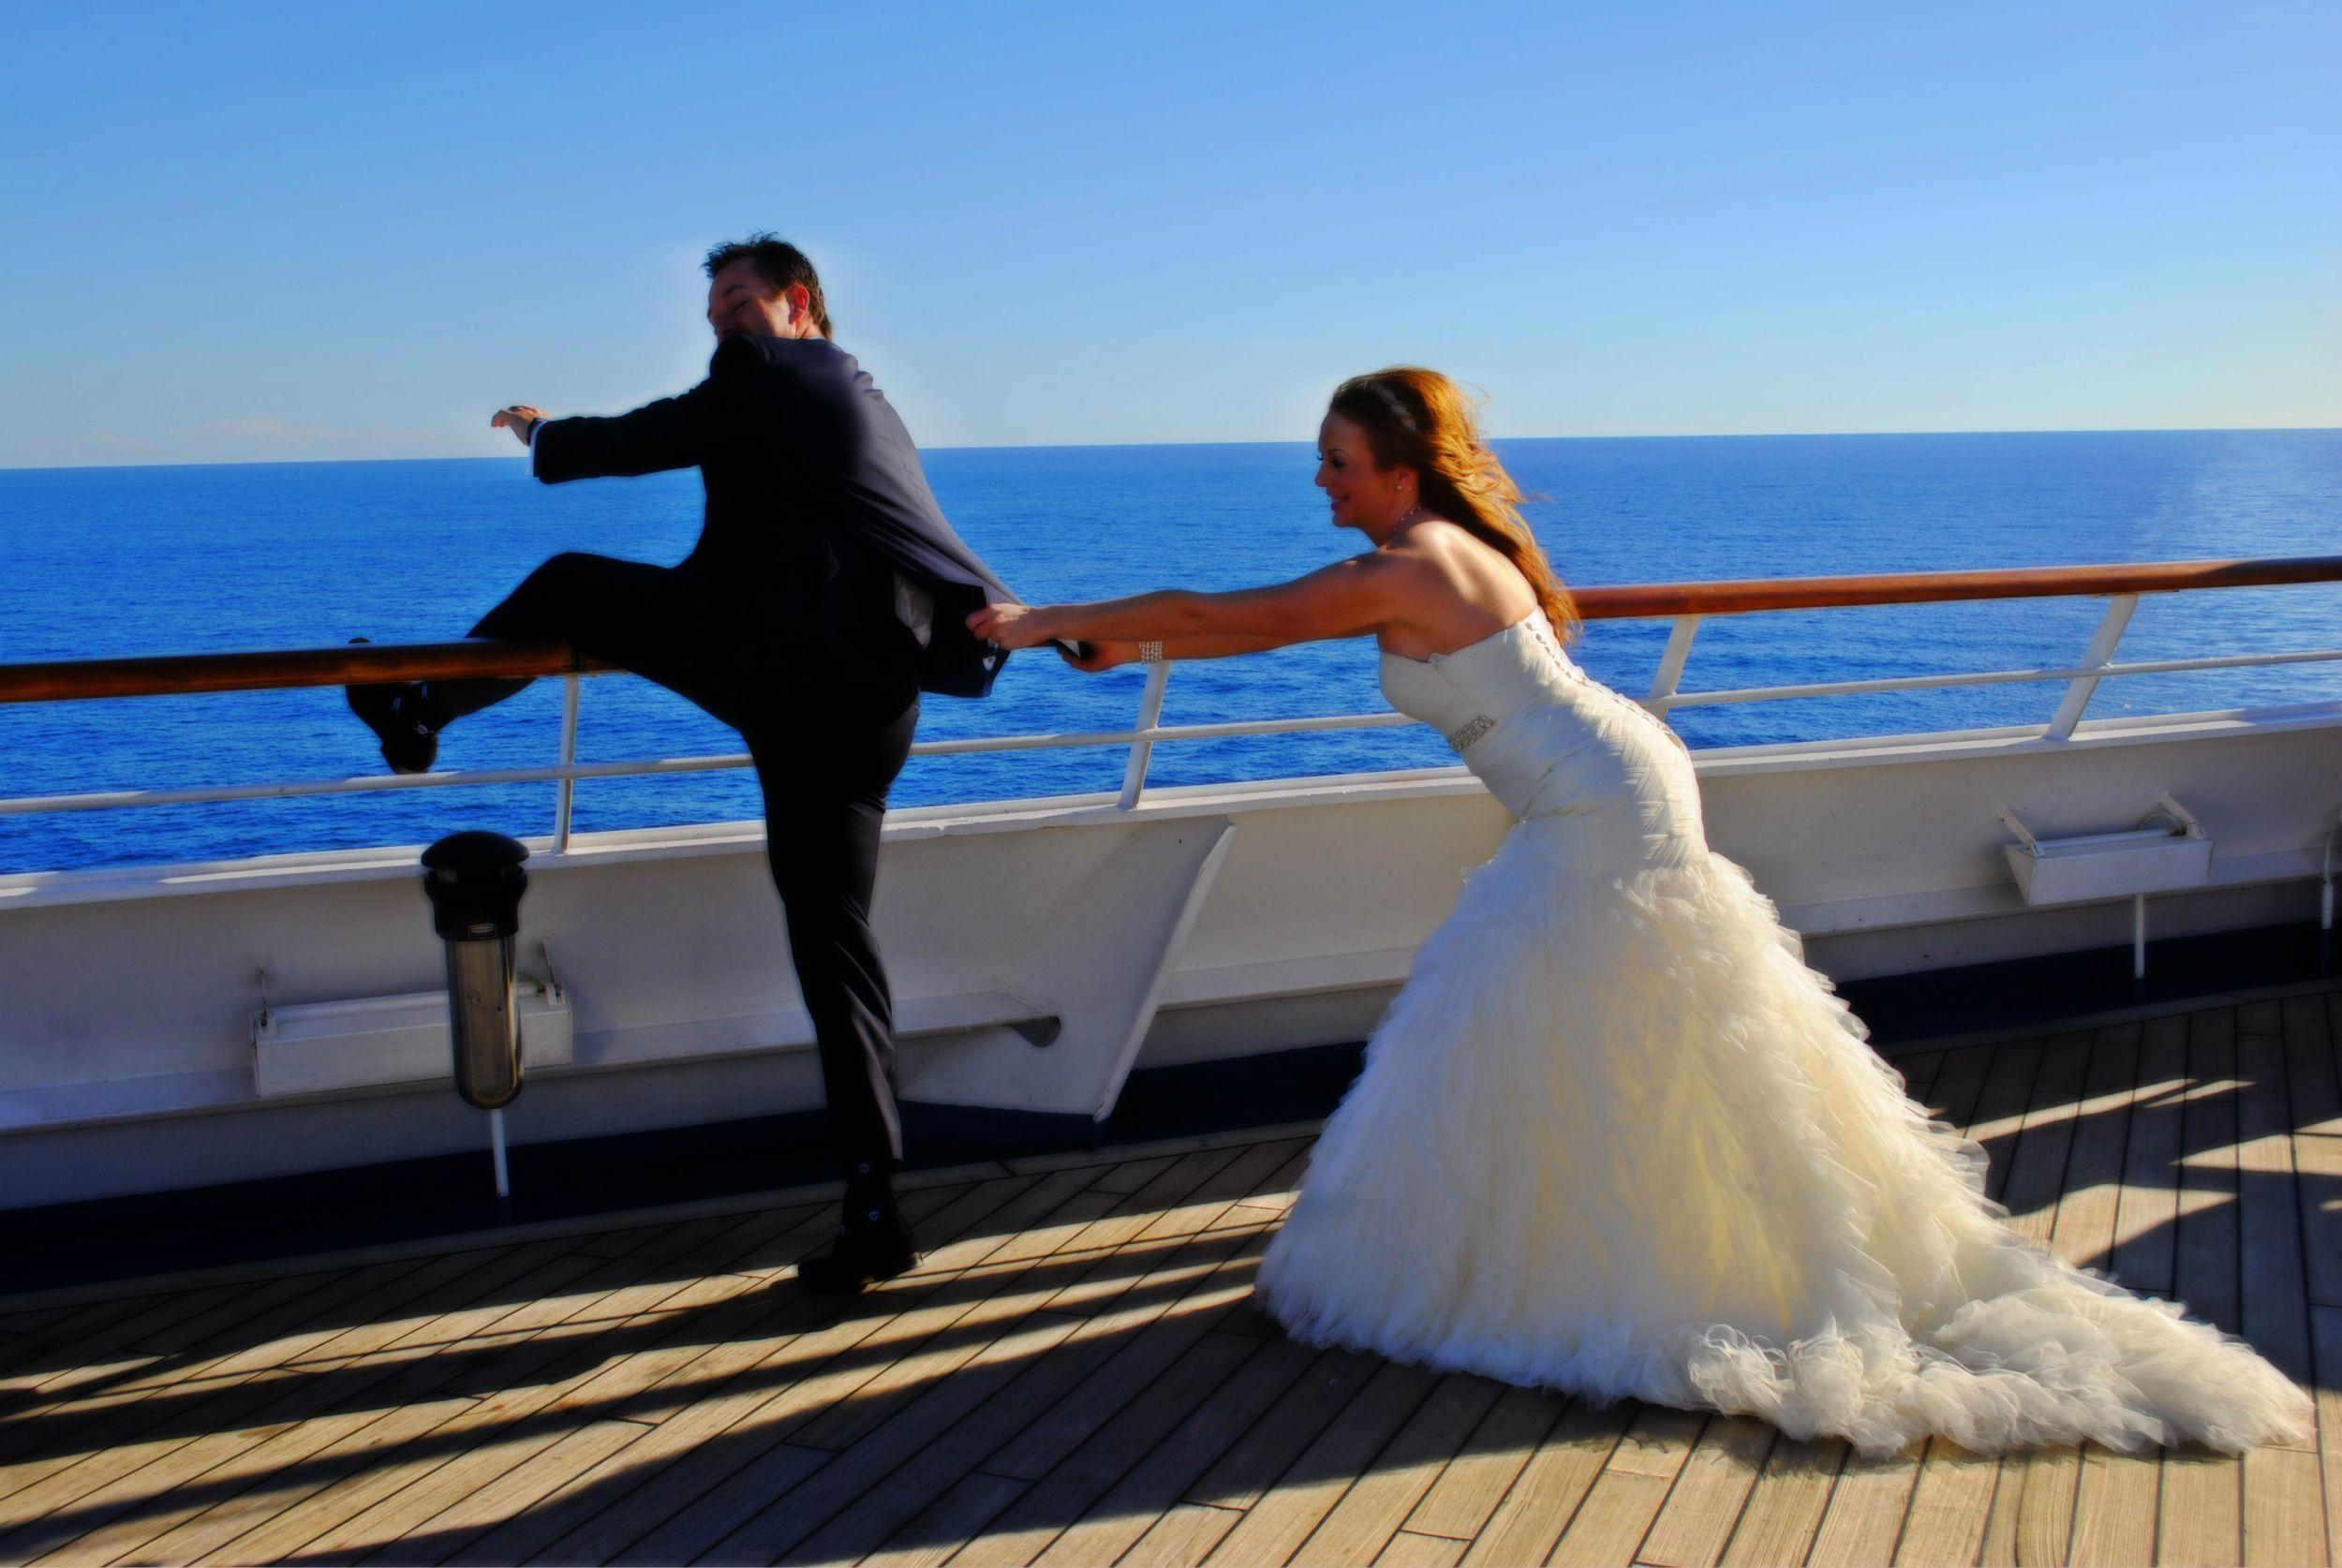 Ha, ha, we had fun with this one! Cruise wedding Carnival